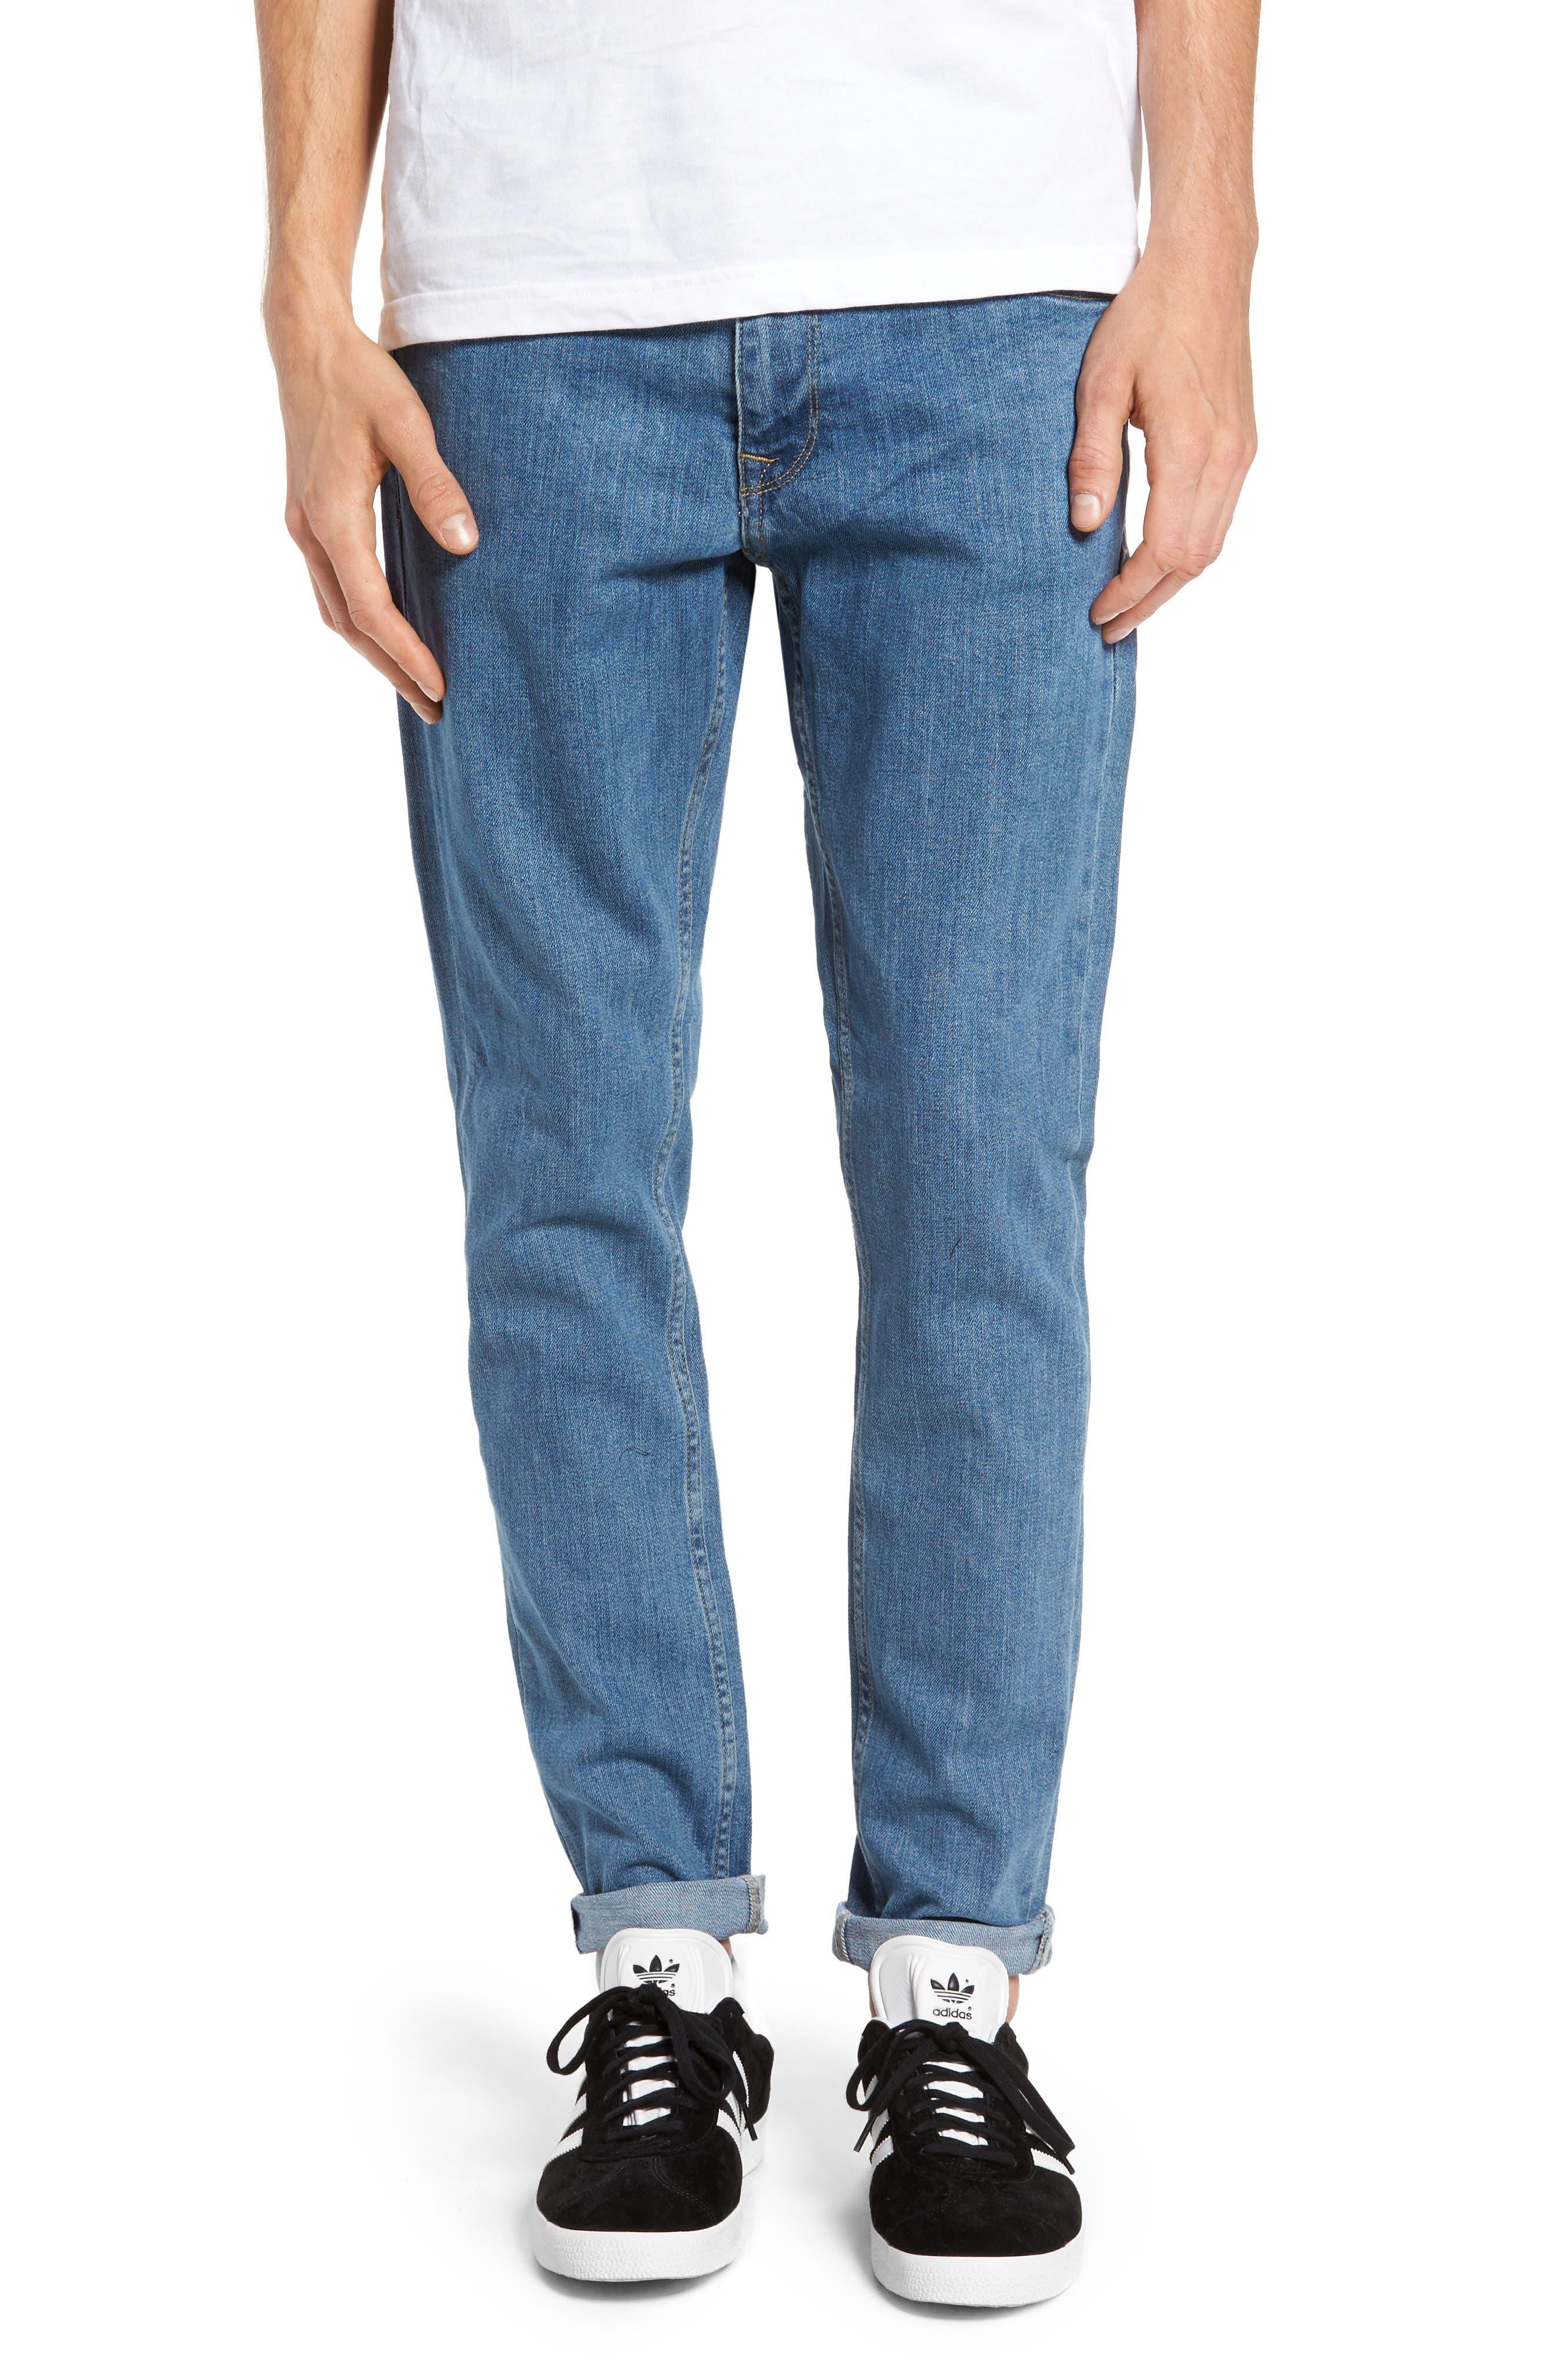 Clark Slim Straight Fit Jeans,                         Main,                         color,